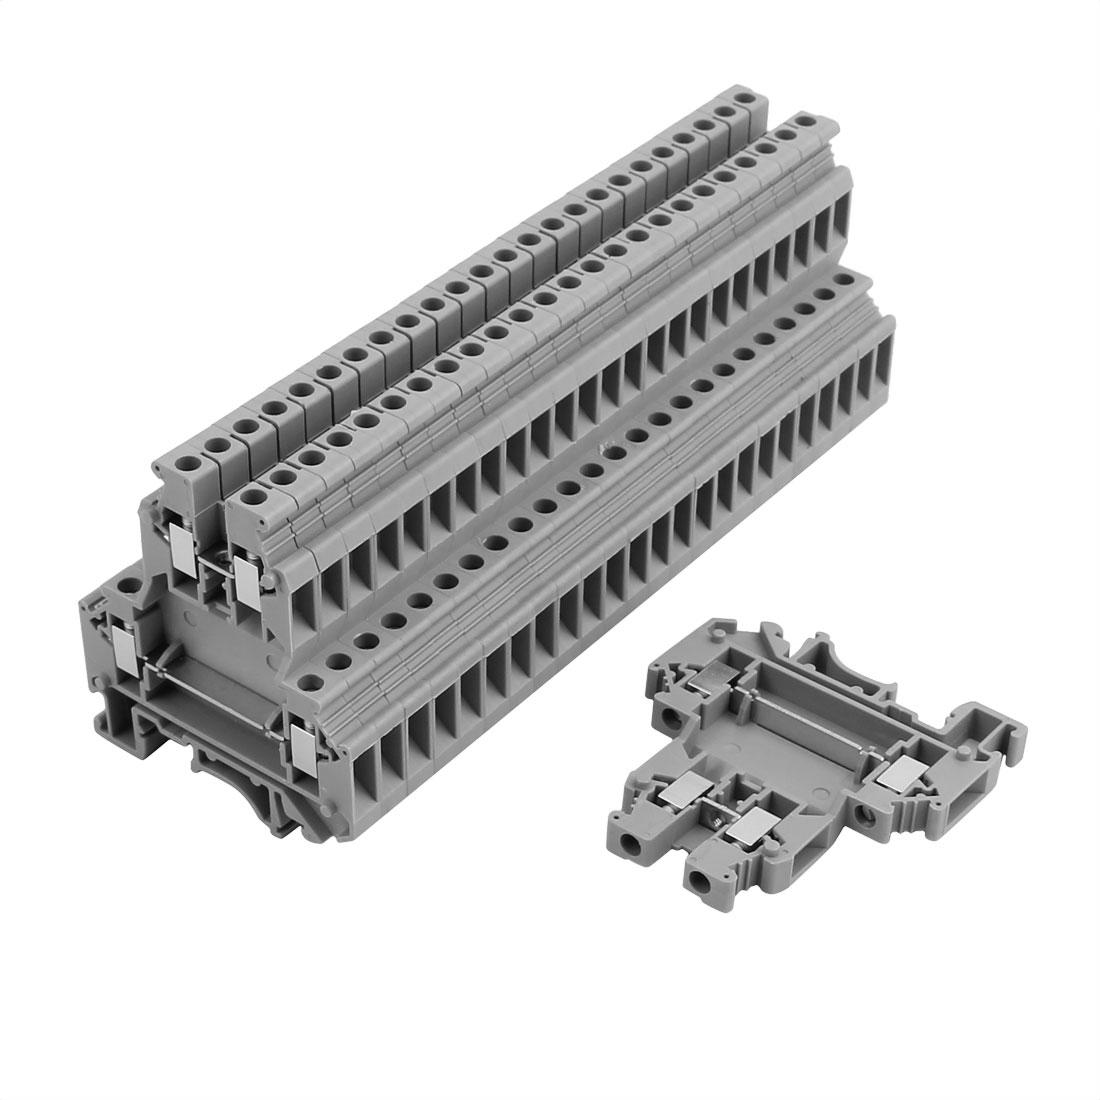 25Pcs UKK5 DIN Rail Mounting Double-level Terminal Block 600V 32A 28-10AWG